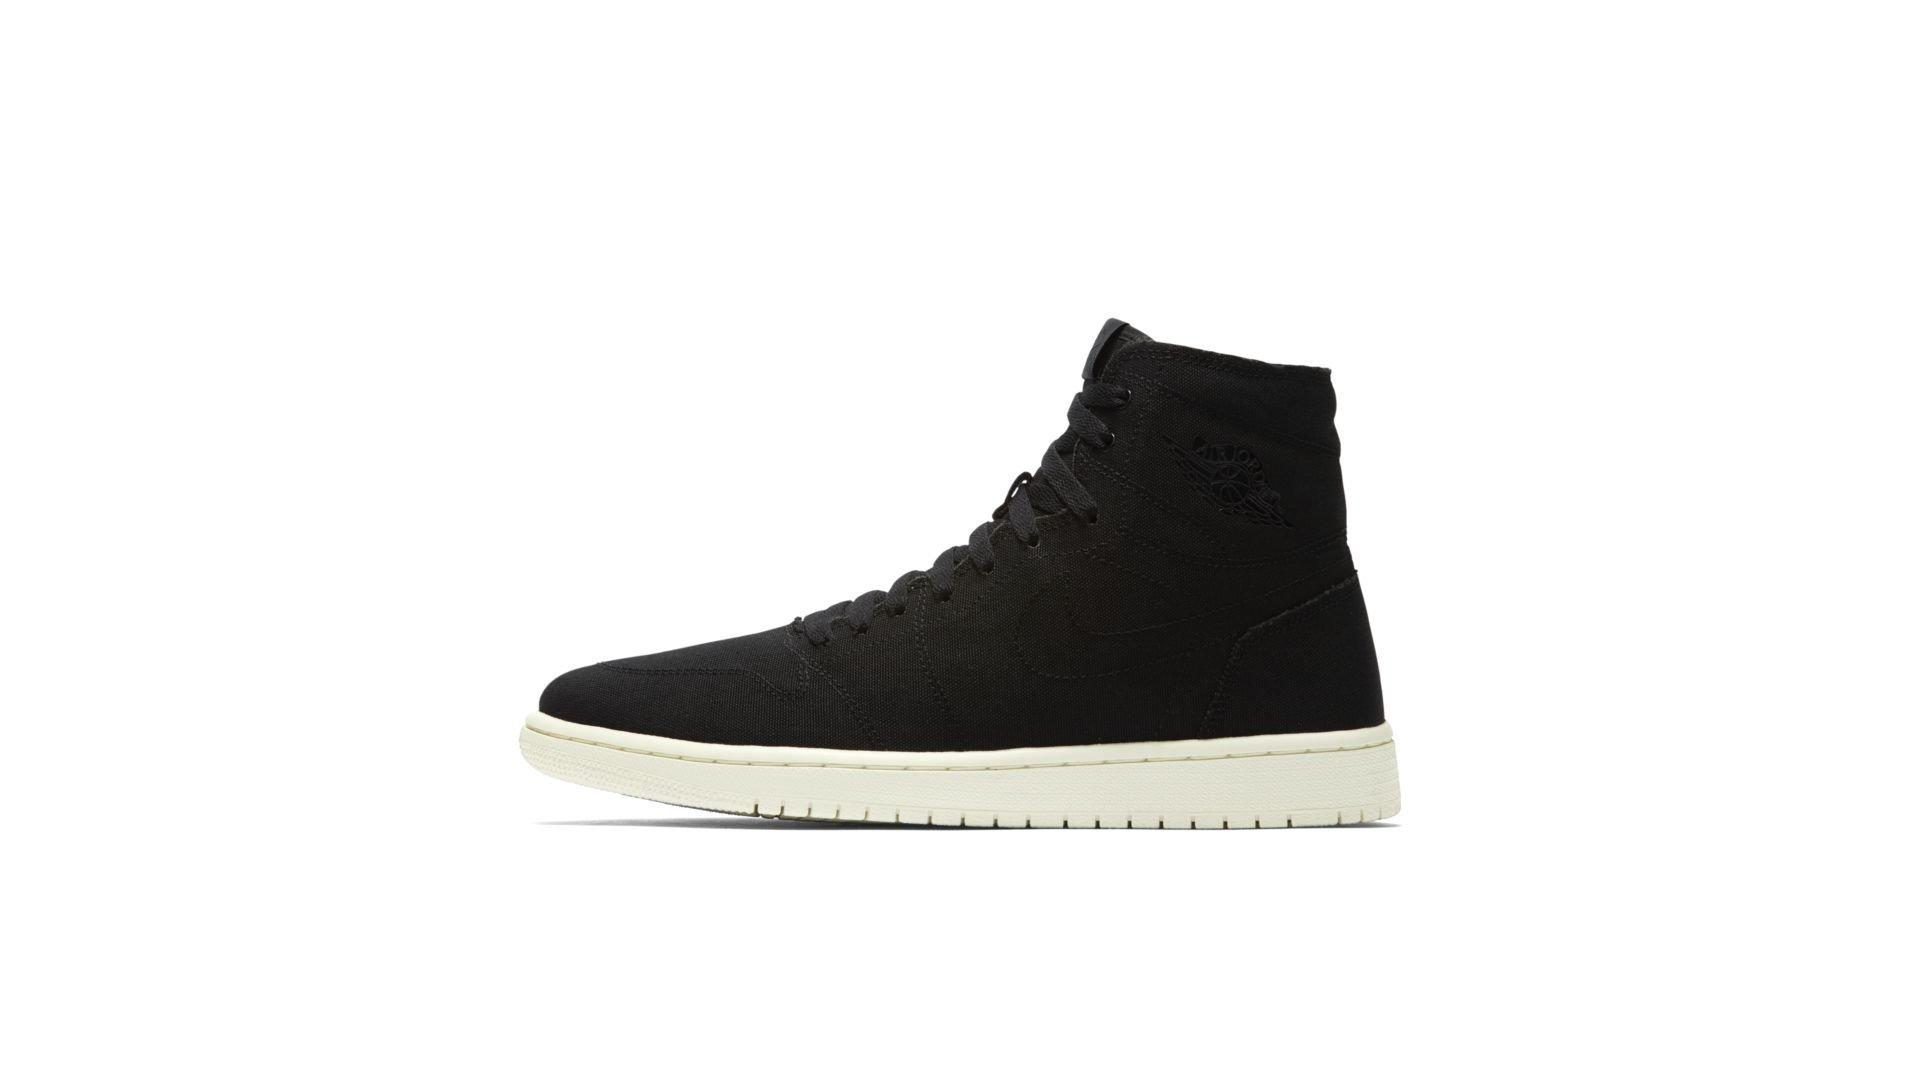 Jordan 1 Retro Deconstrcuted Black (867338-010)